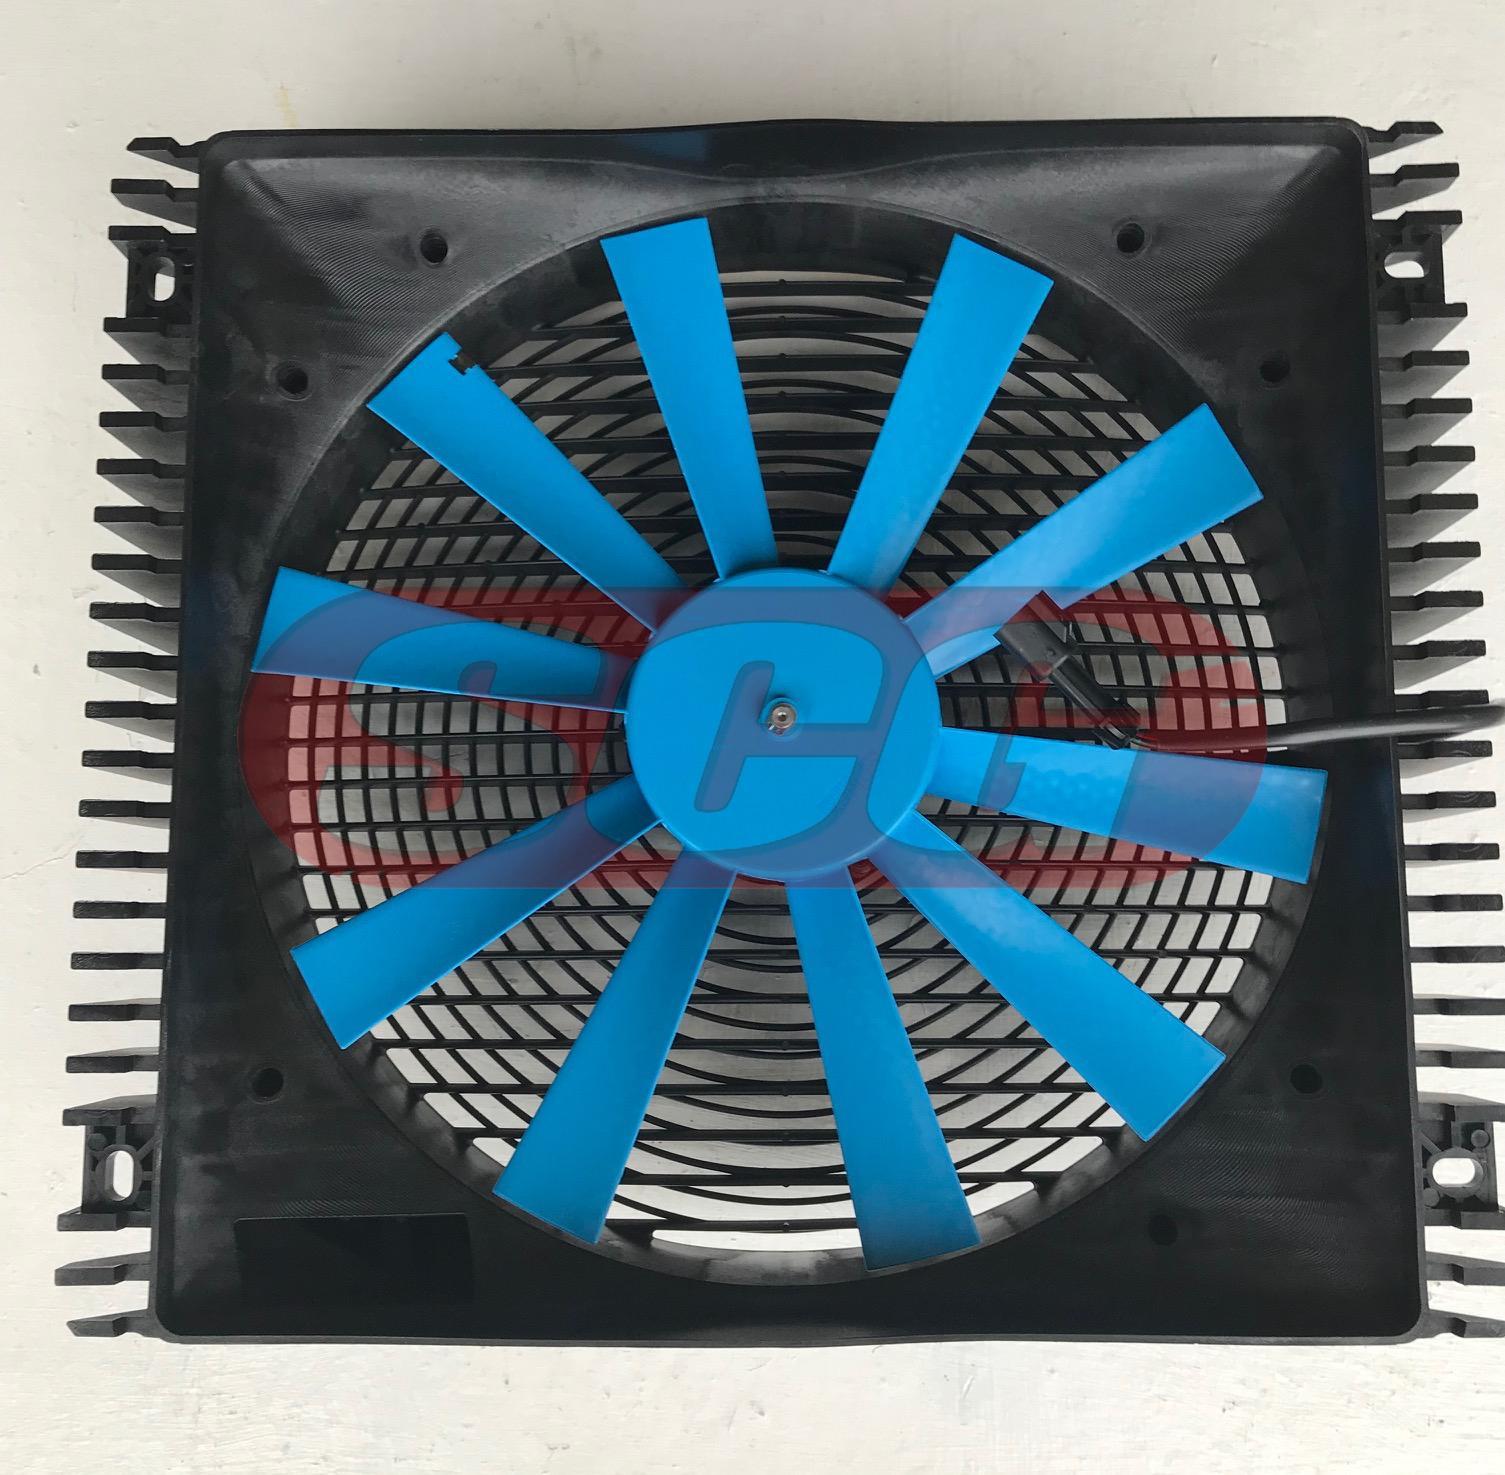 c9f50c42a00a 10.35.0021 Cooling Fan - SCG Supplies